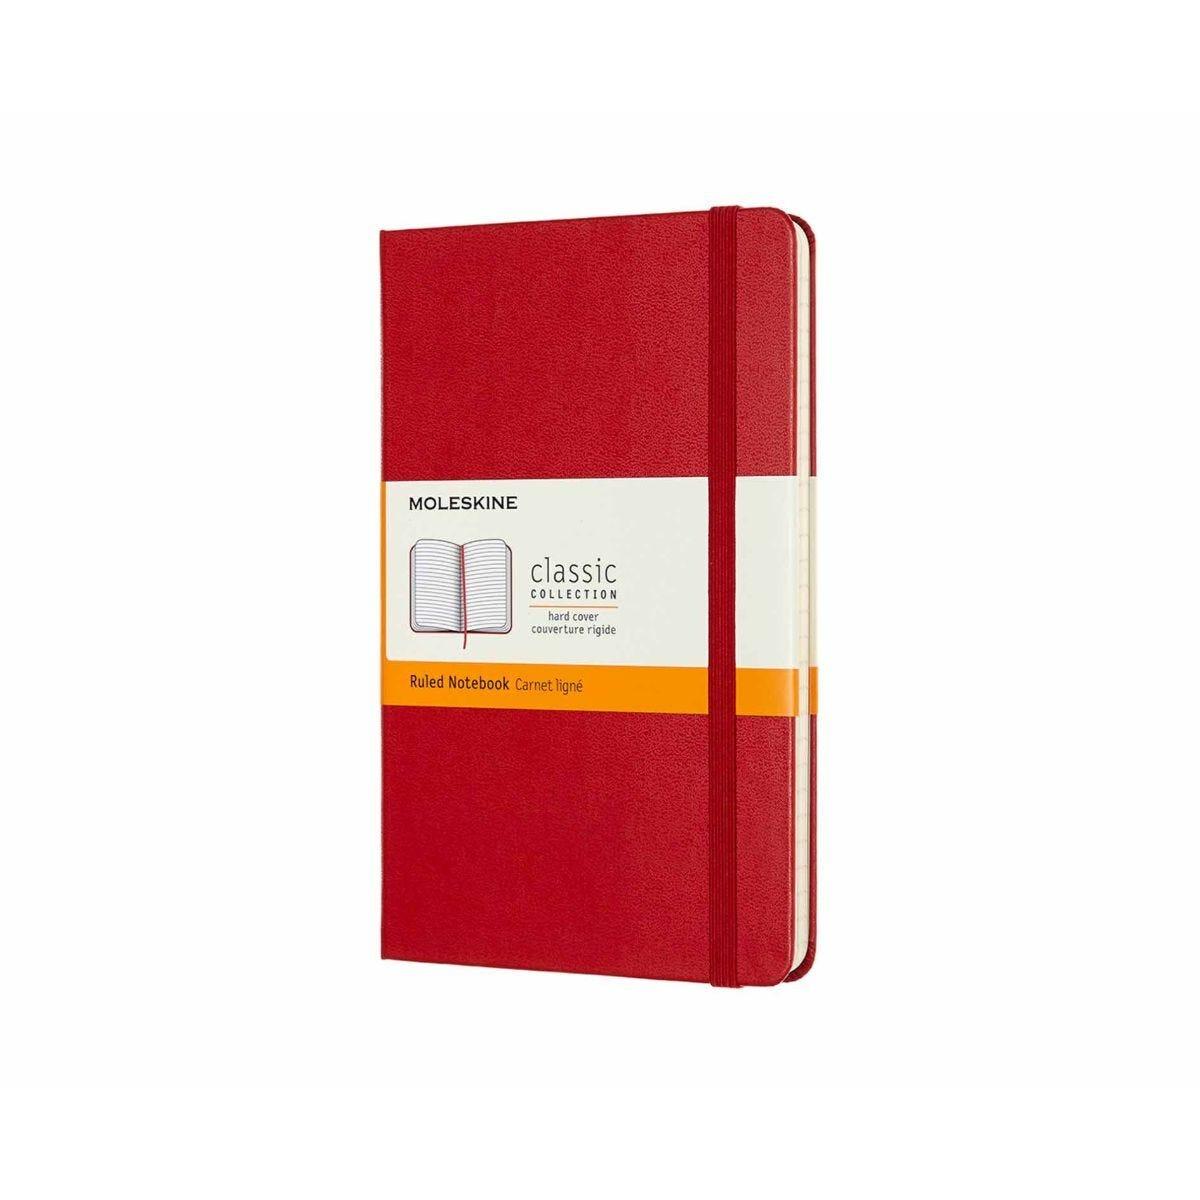 Moleskine Classic Notebook Hardcover Medium Ruled Scarlet Red